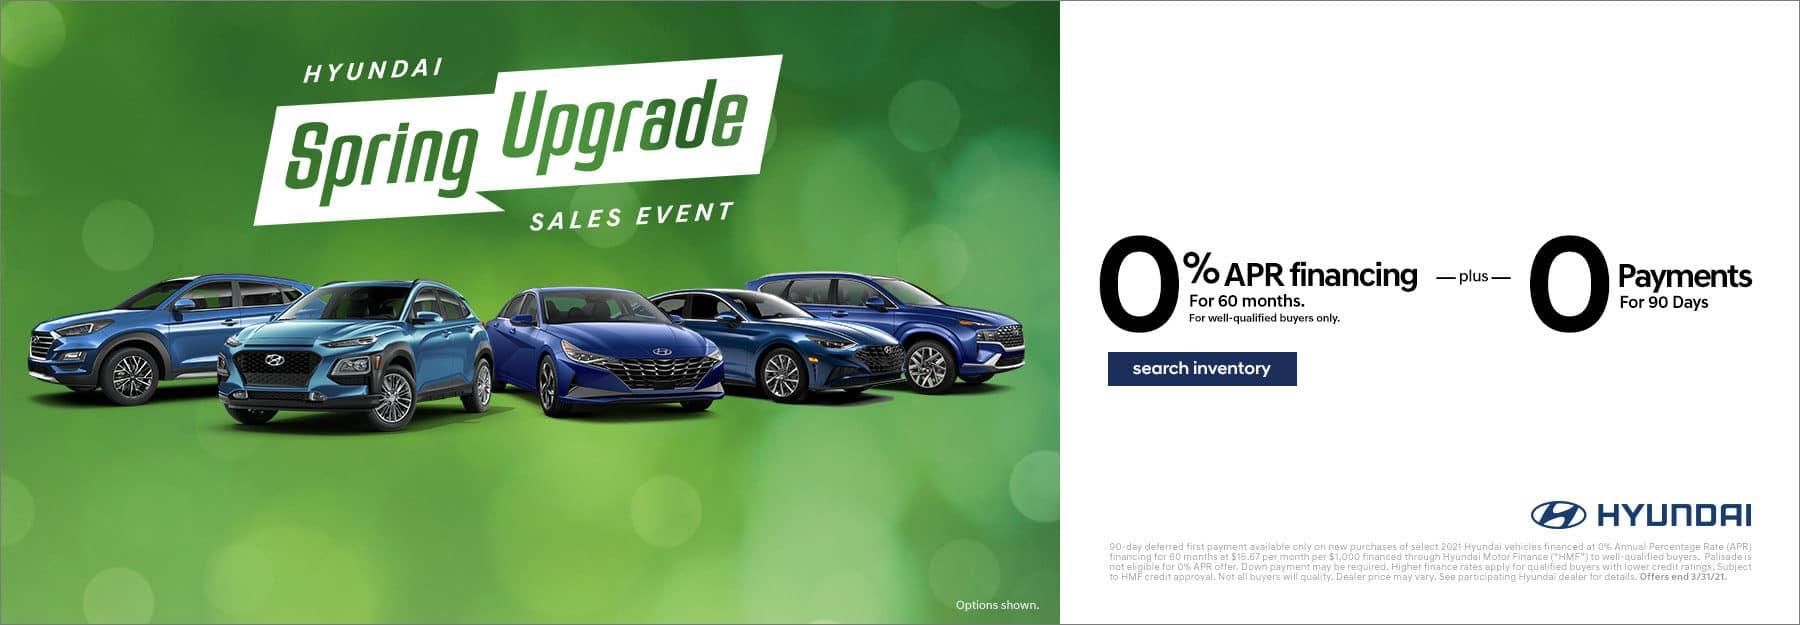 Hyundai Spring Upgrade 0% APR